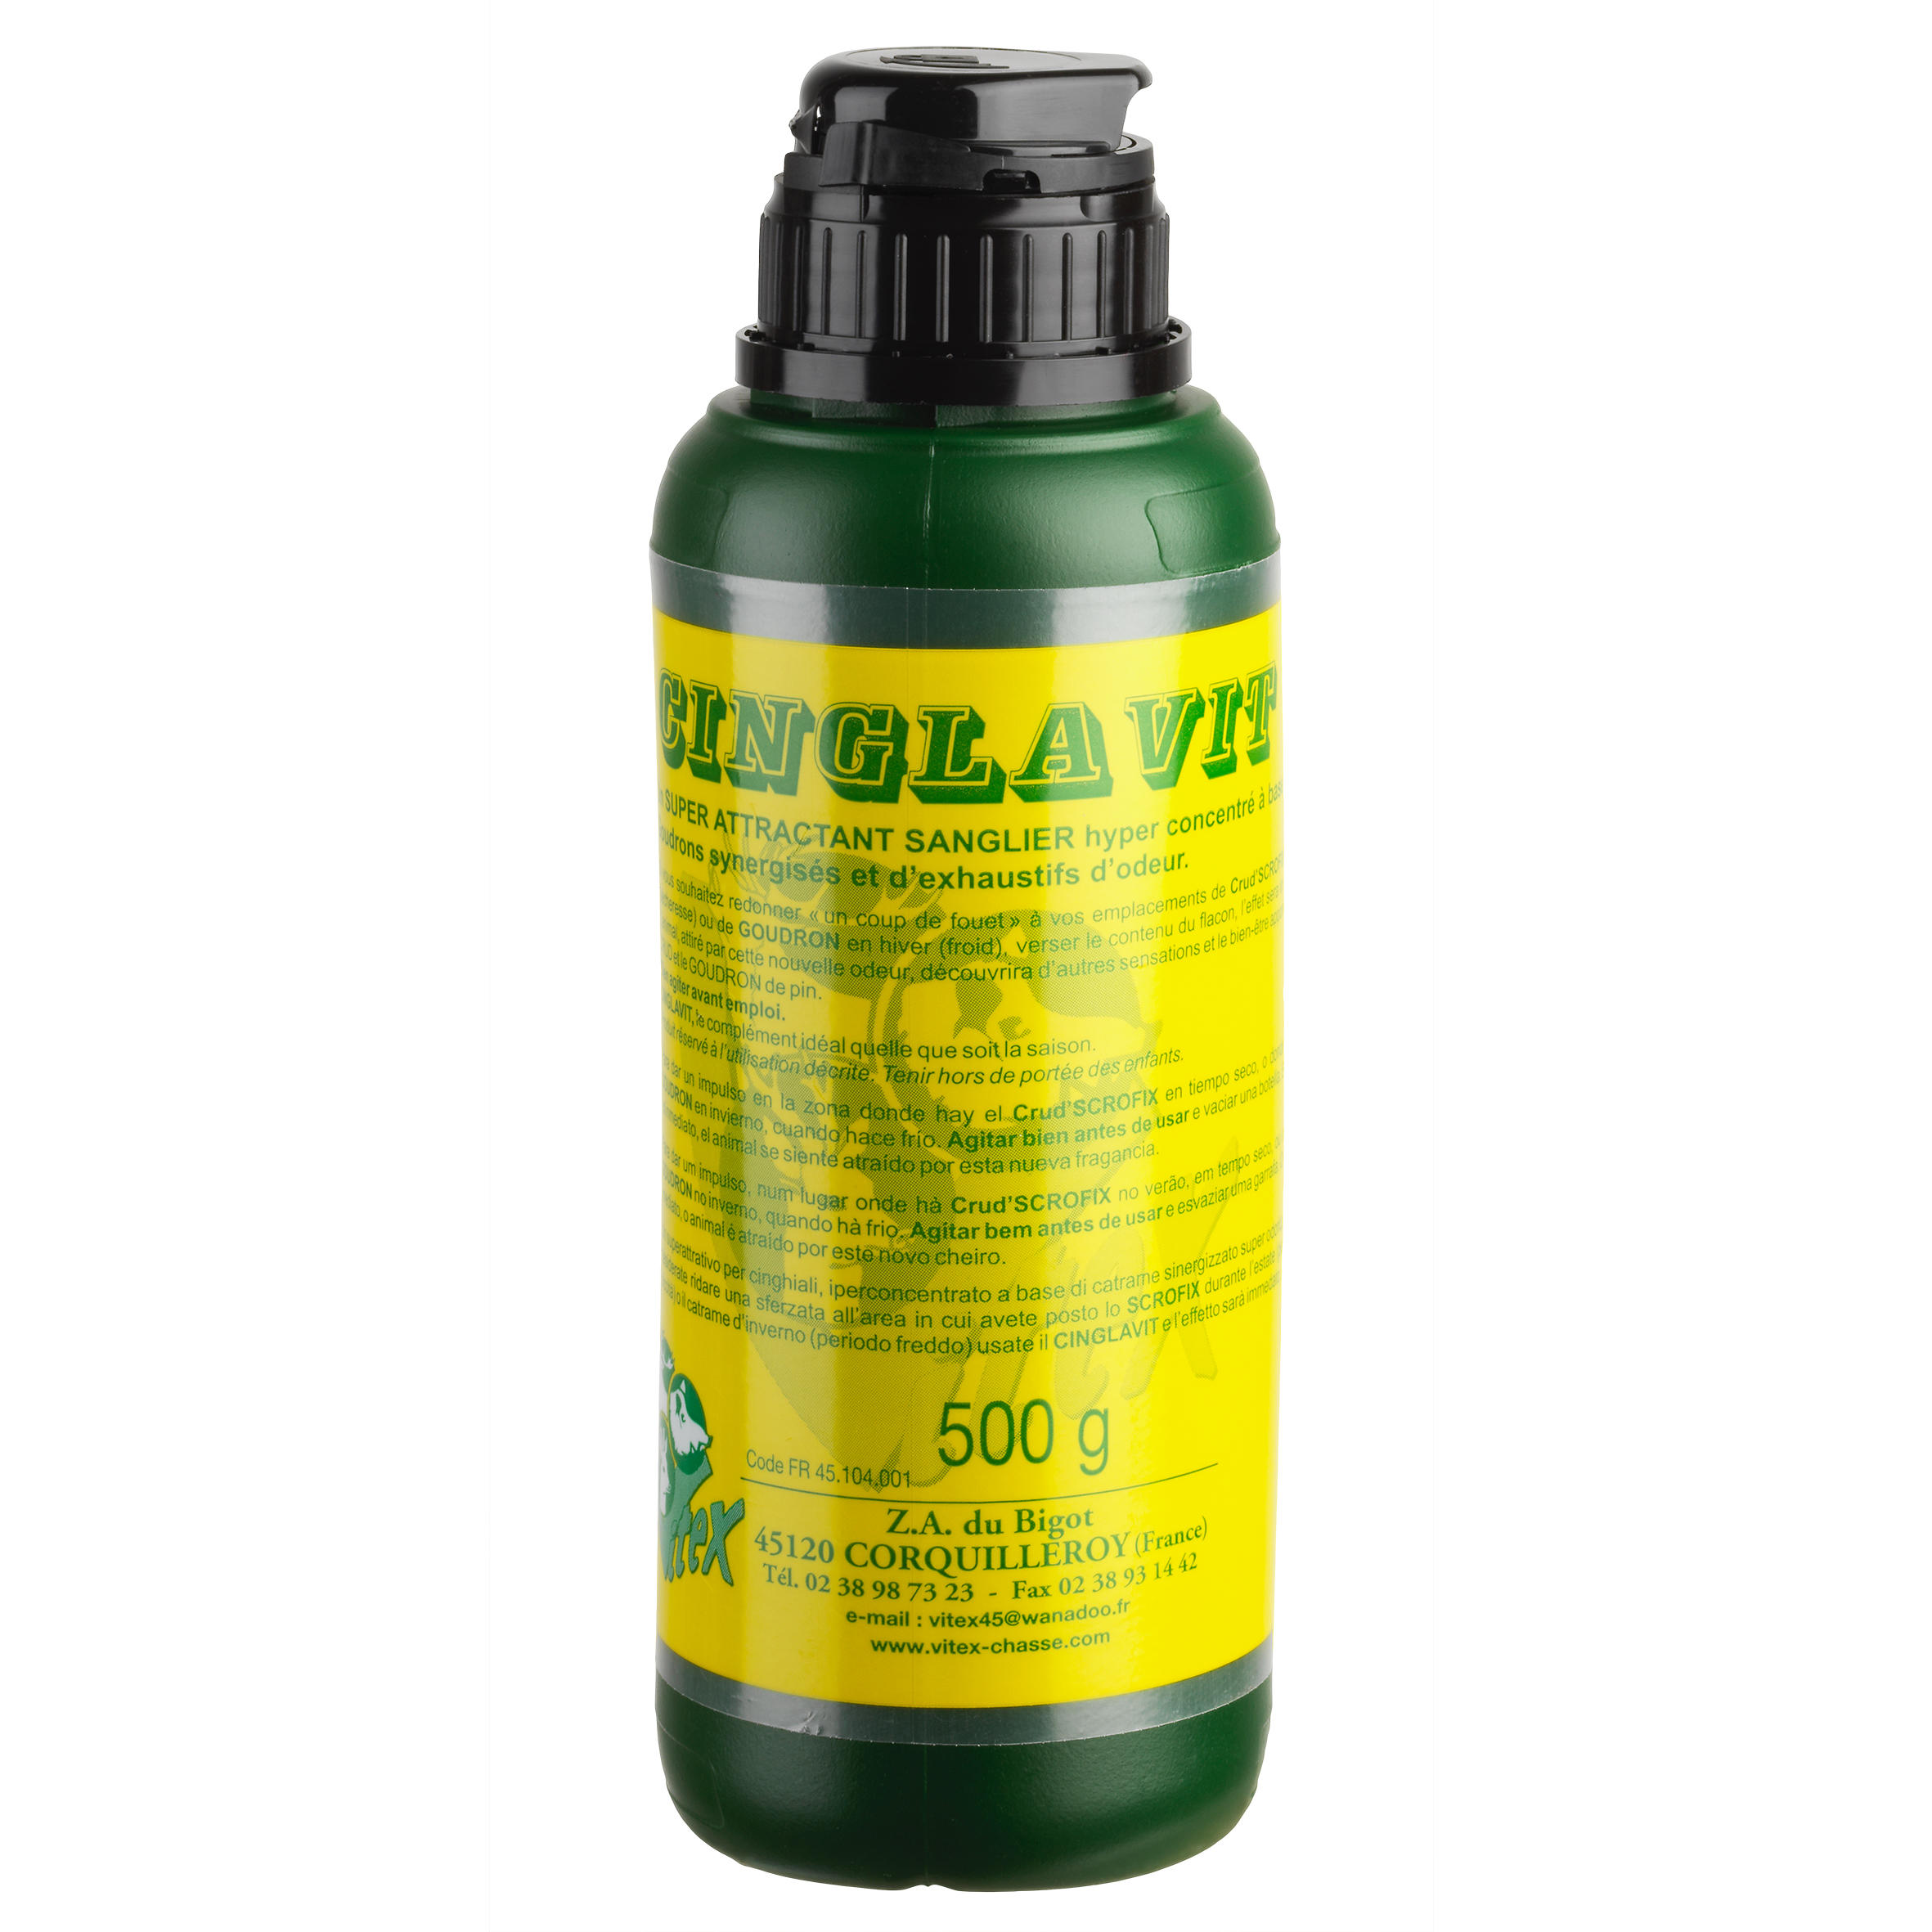 Vitex Lokmiddel everzwijn Cinglavit 500 g